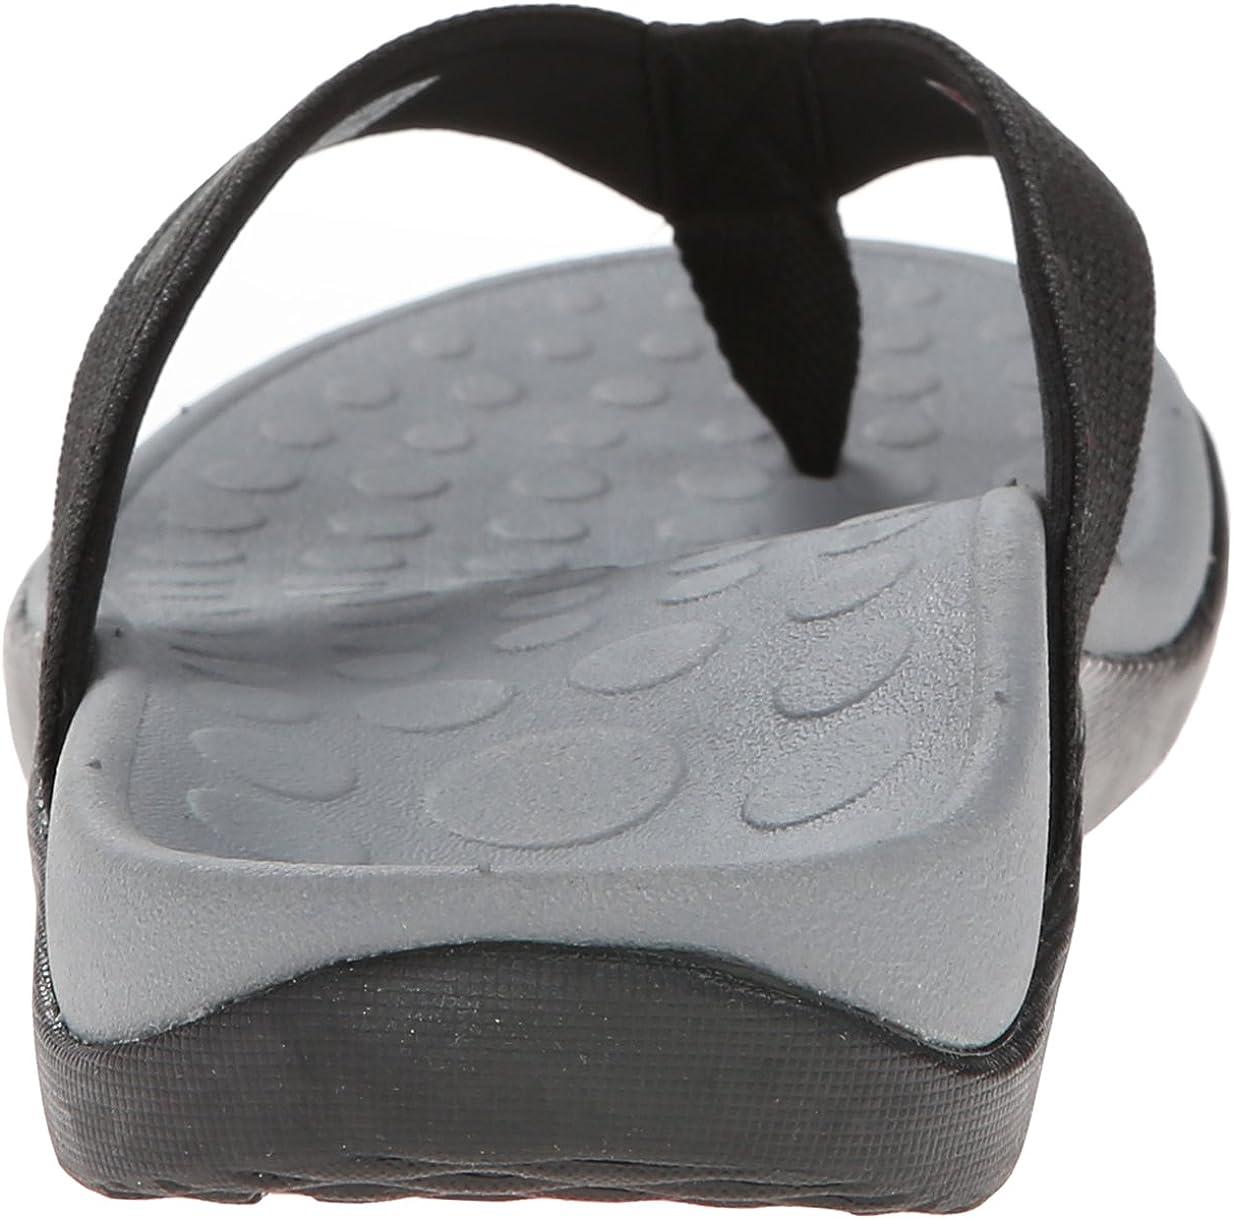 Vionic Unisex Wave Toe Post Sandal